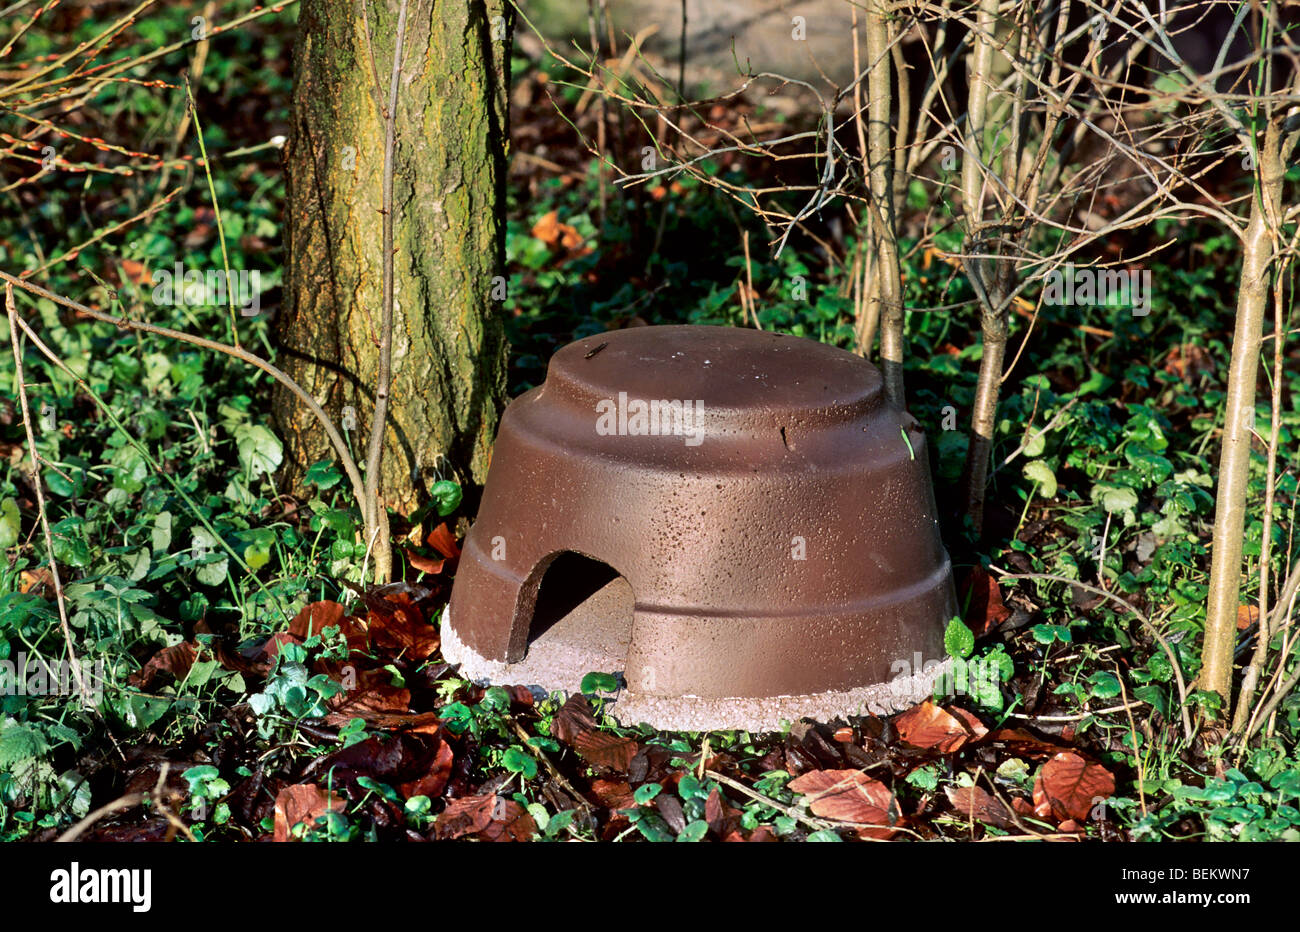 Nest in hogbox in garden for hibernating European hedgehog (Erinaceus europaeus) in winter - Stock Image